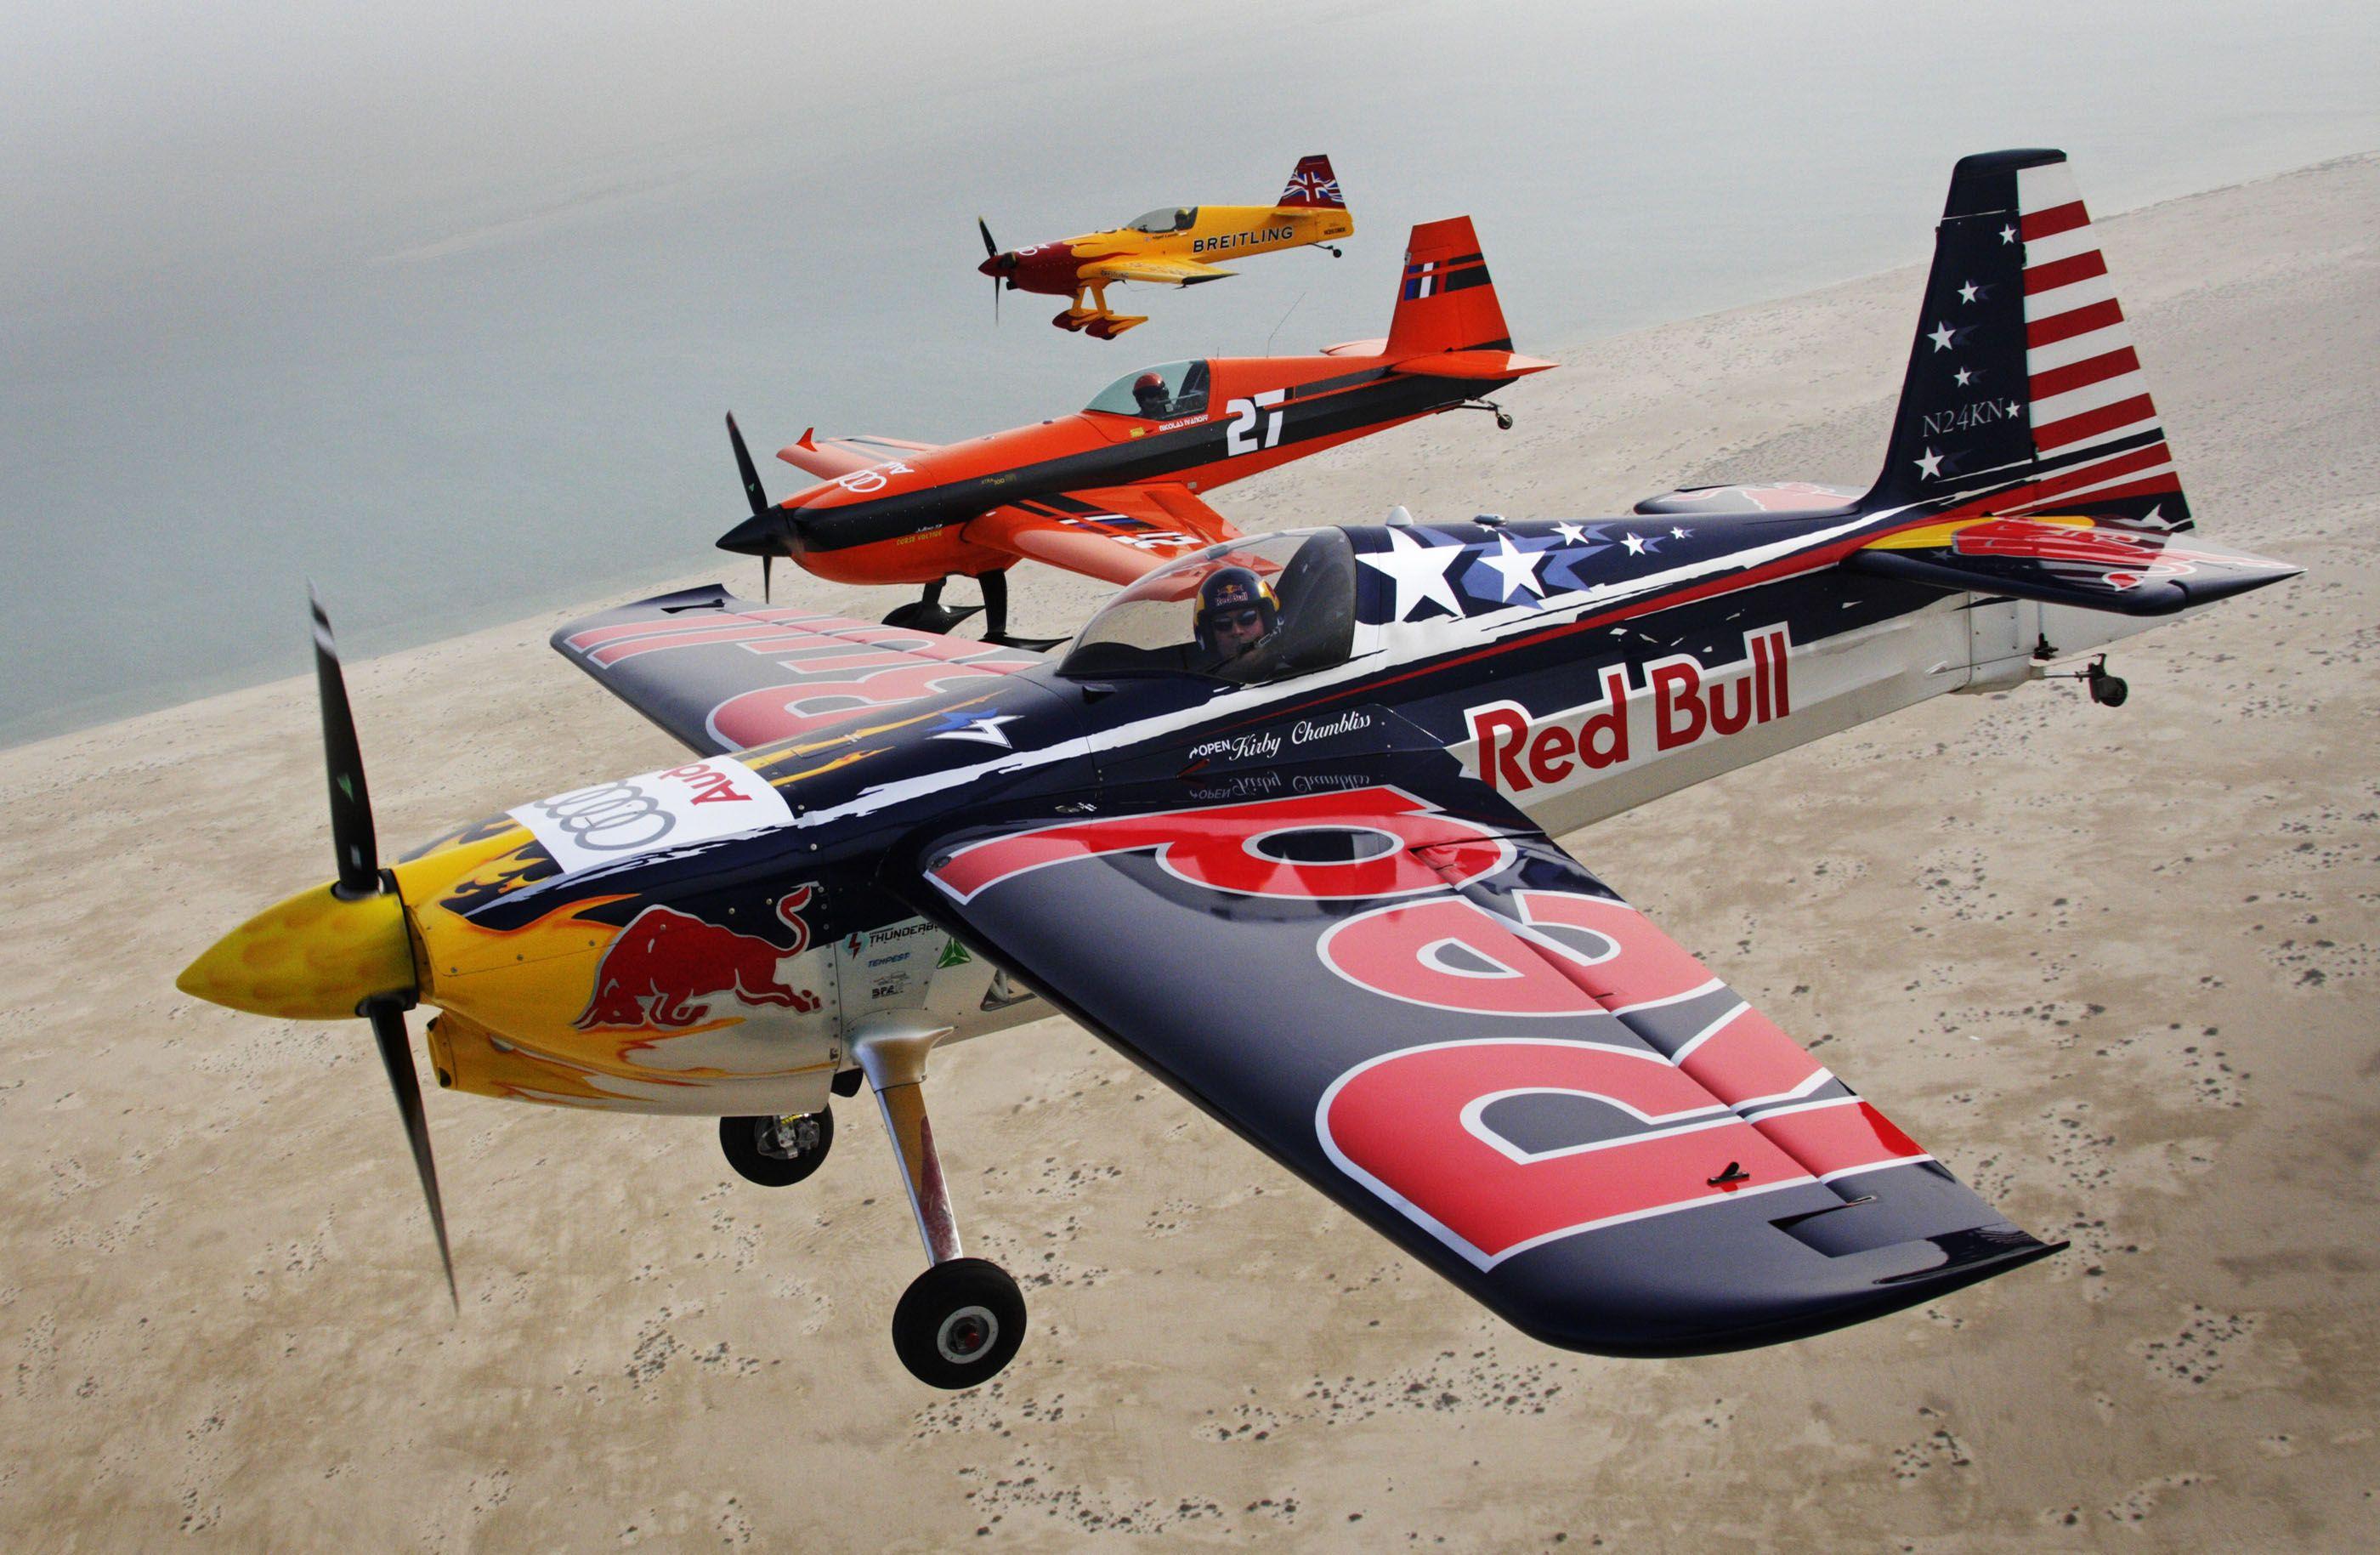 RED-BULL-AIR-RACE airplane plane race racing red bull